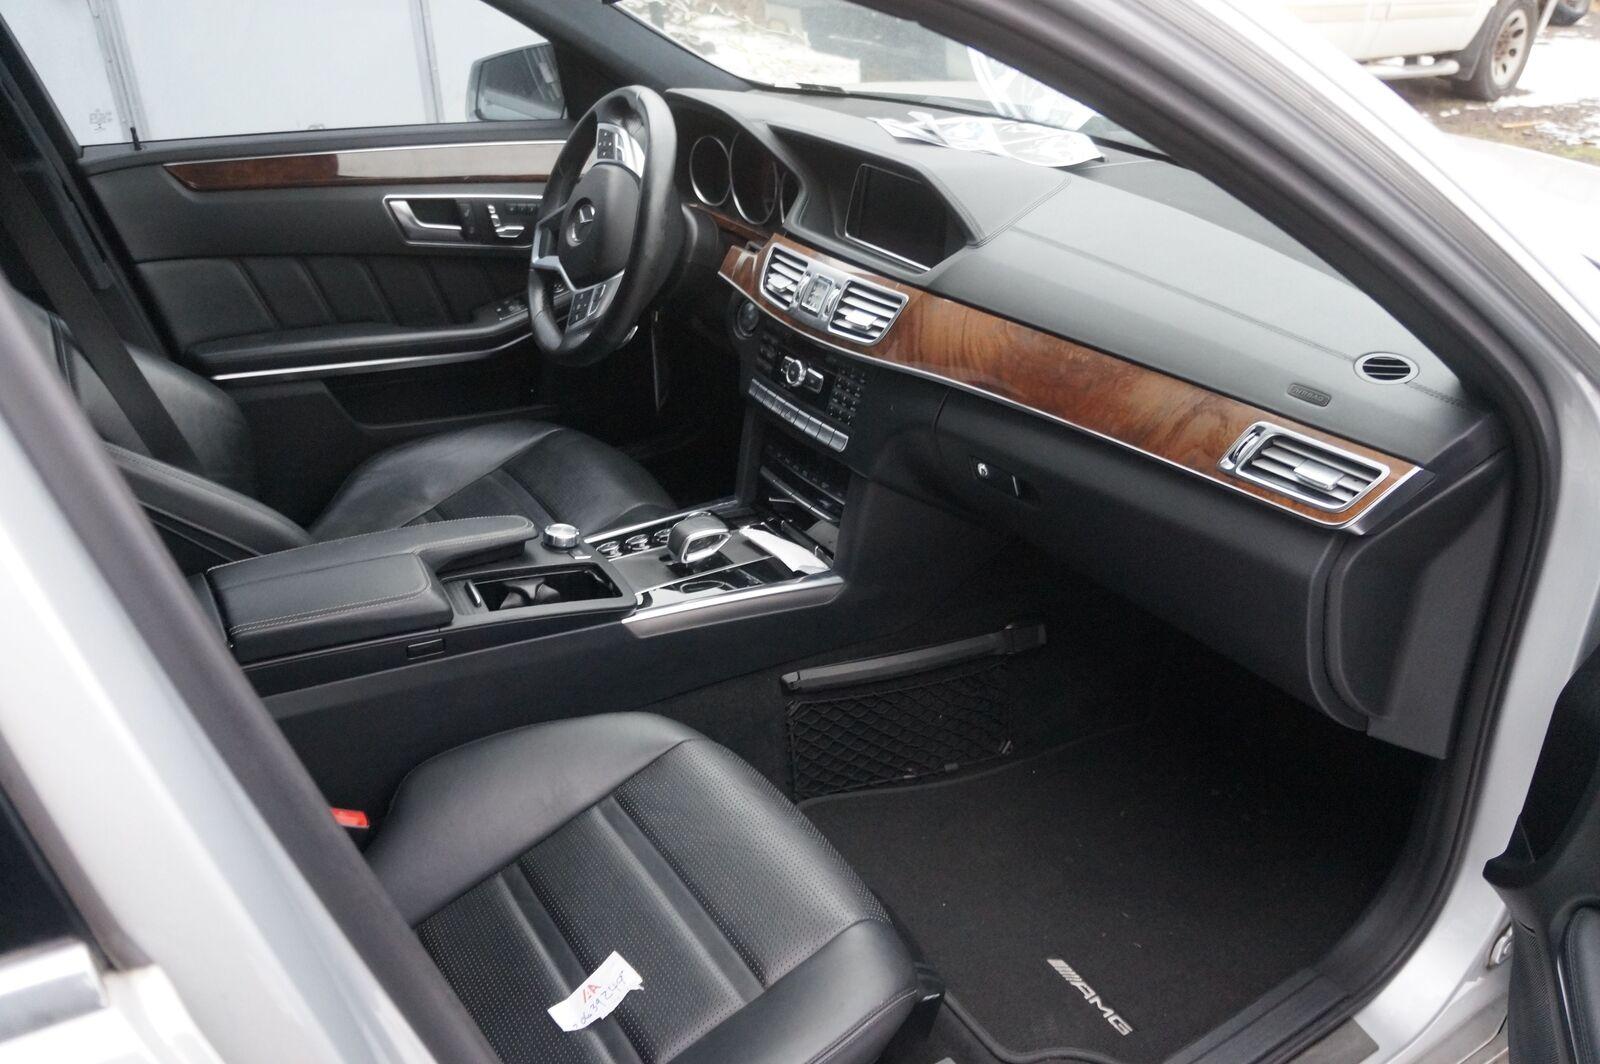 8c5f1bf4 Set Left Right Sun Visor Mirror Black OEM Mercedes E350 E550 E63 ...